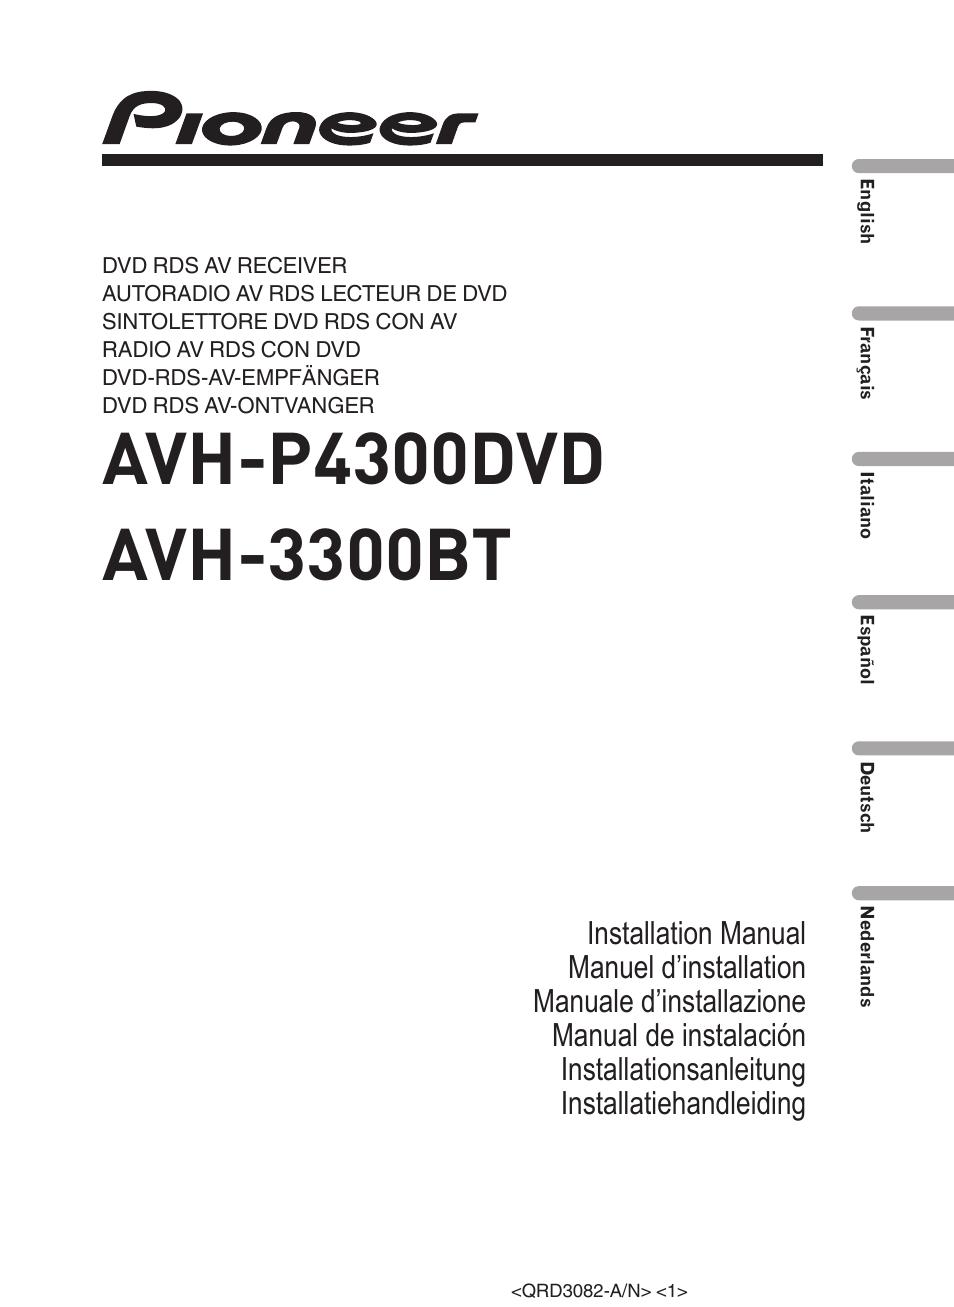 medium resolution of avh p4300dvd wiring diagram wiring diagram technic pioneer